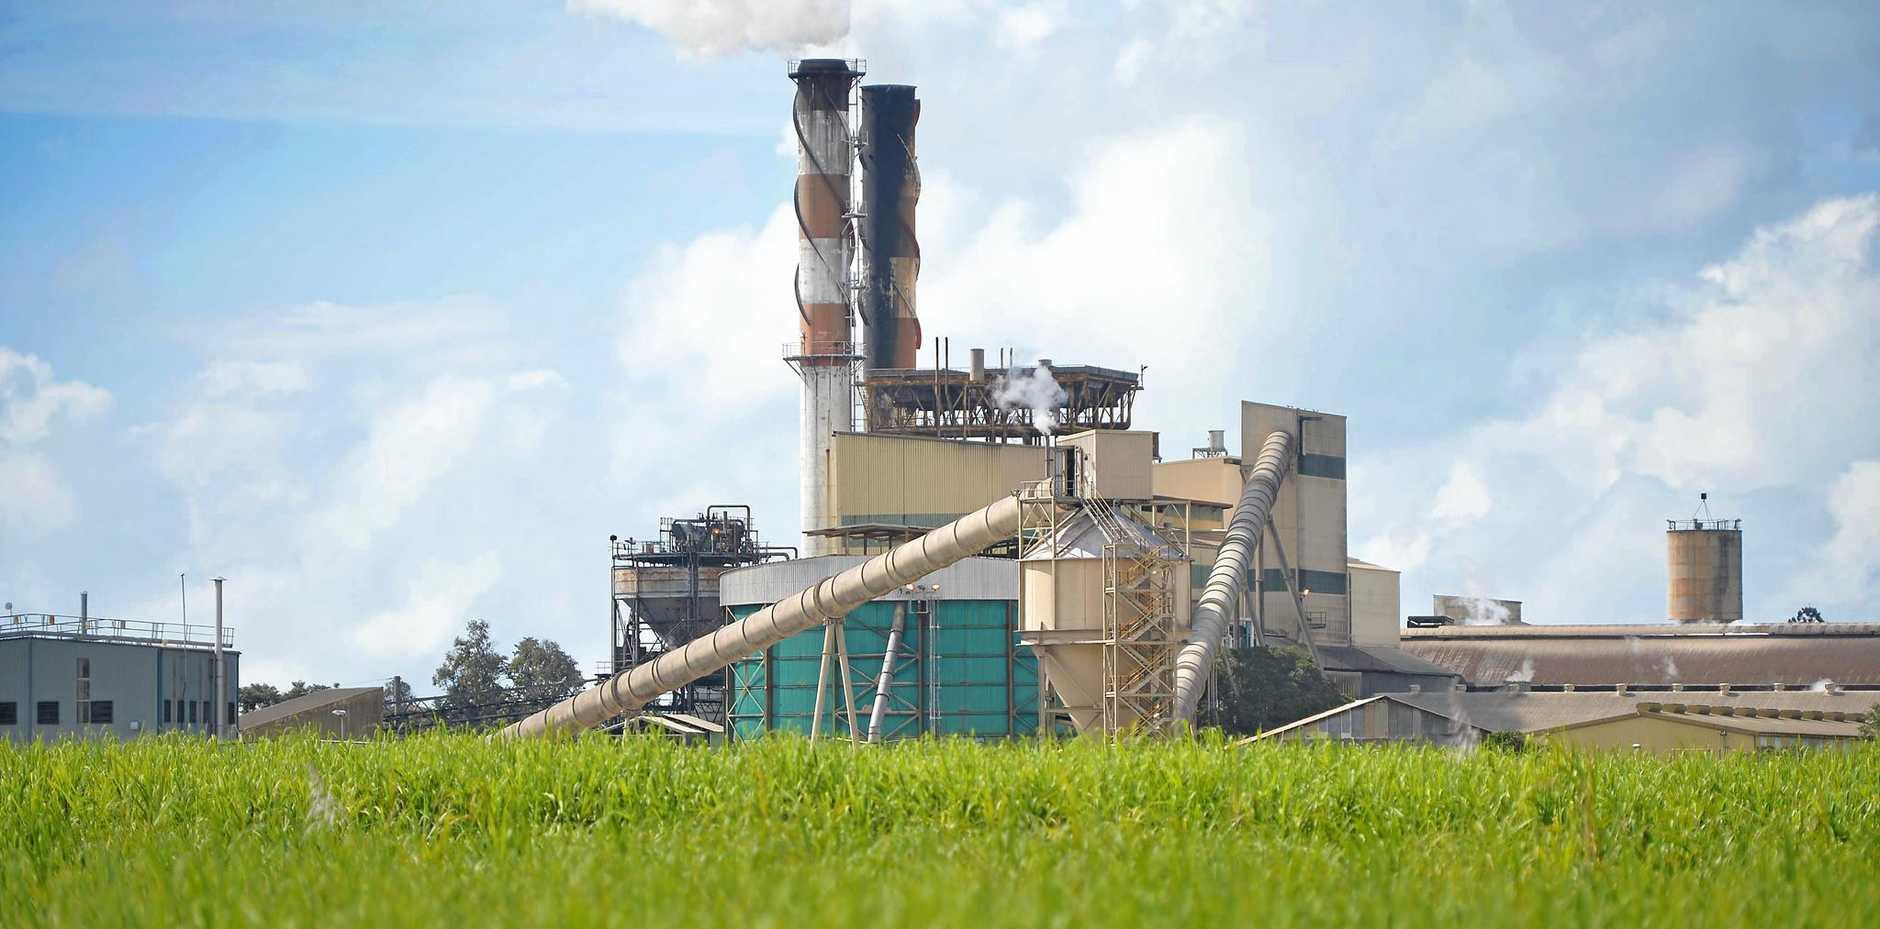 Mackay Sugar's Racecourse Mill crushed 49,849 tonnes this week.